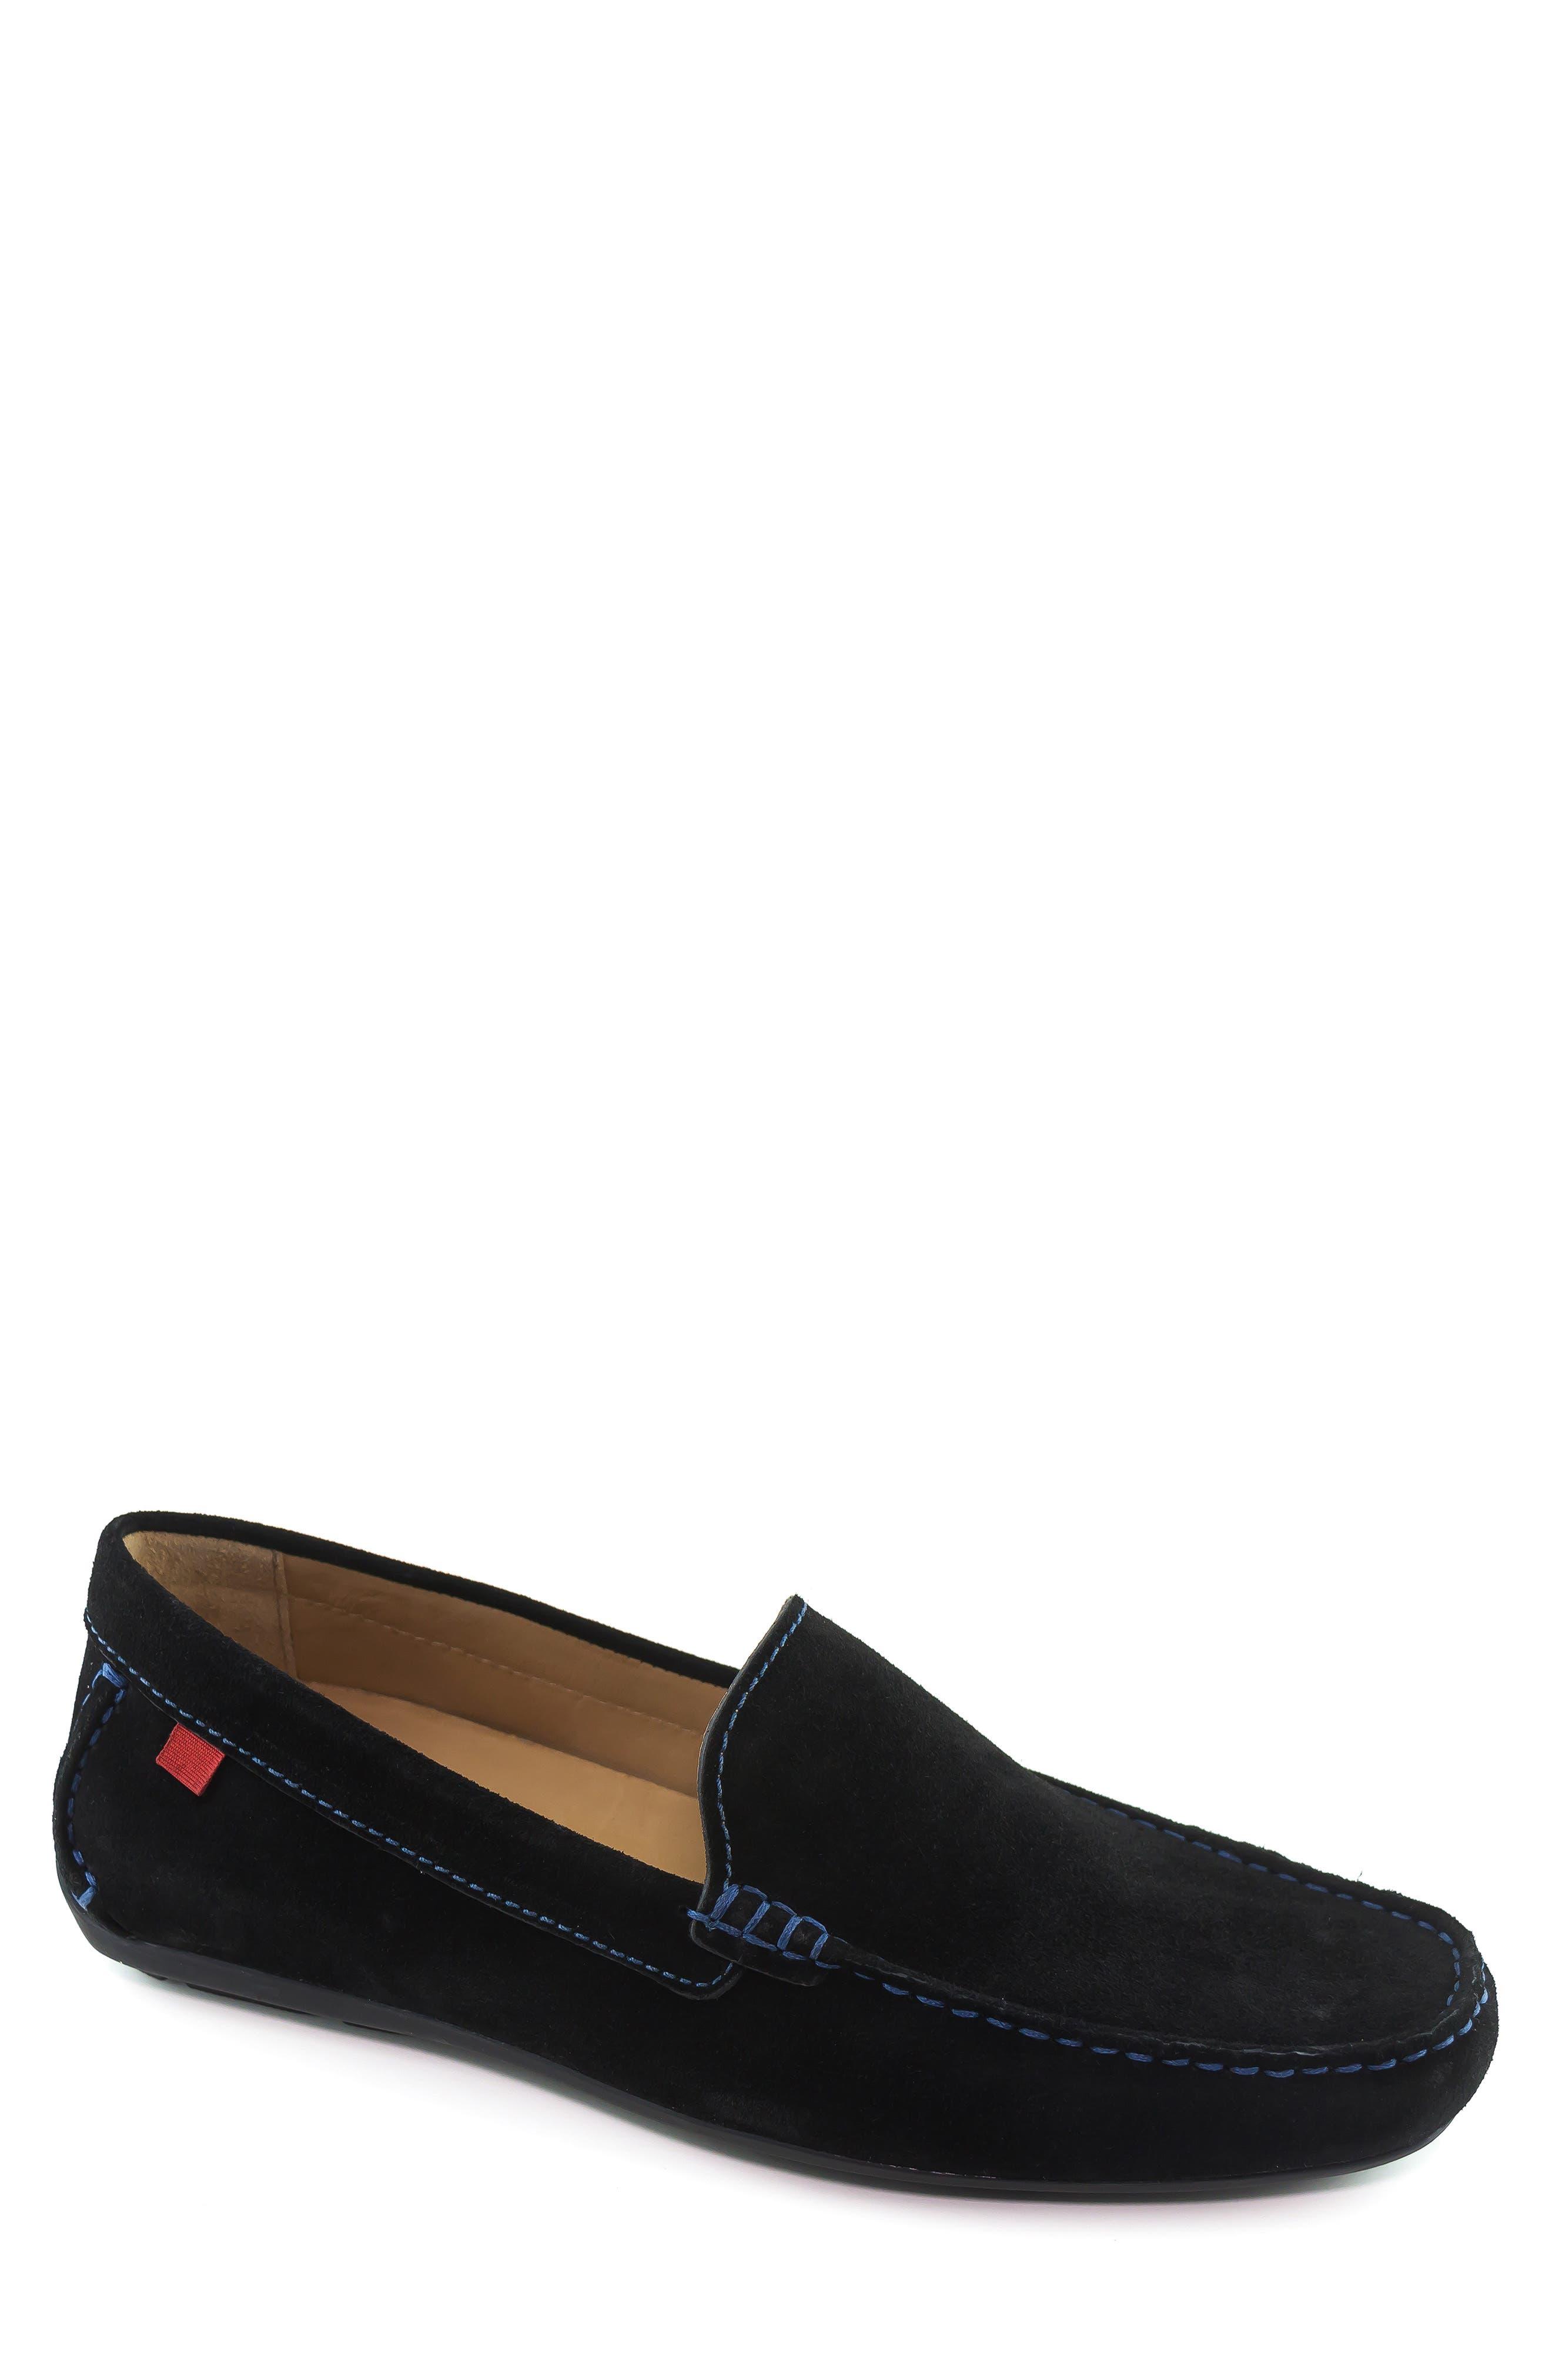 'Broadway' Driving Shoe,                         Main,                         color, BLACK SUEDE